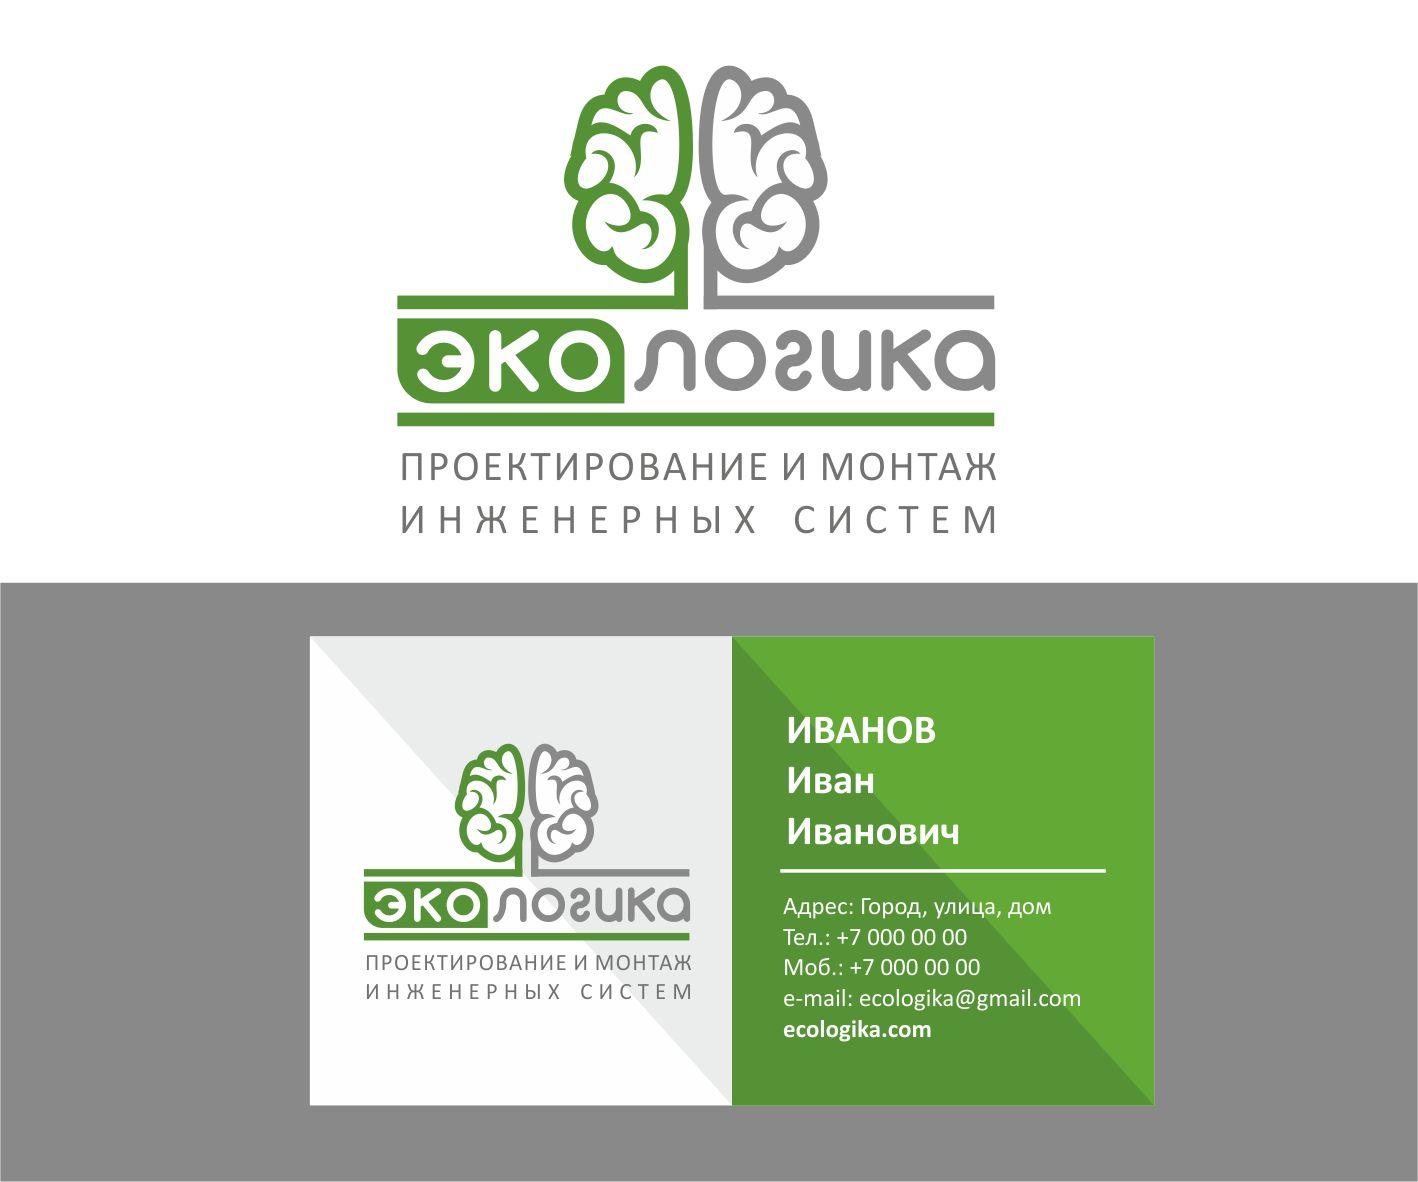 Логотип ЭКОЛОГИКА фото f_784593ece55756c2.jpg